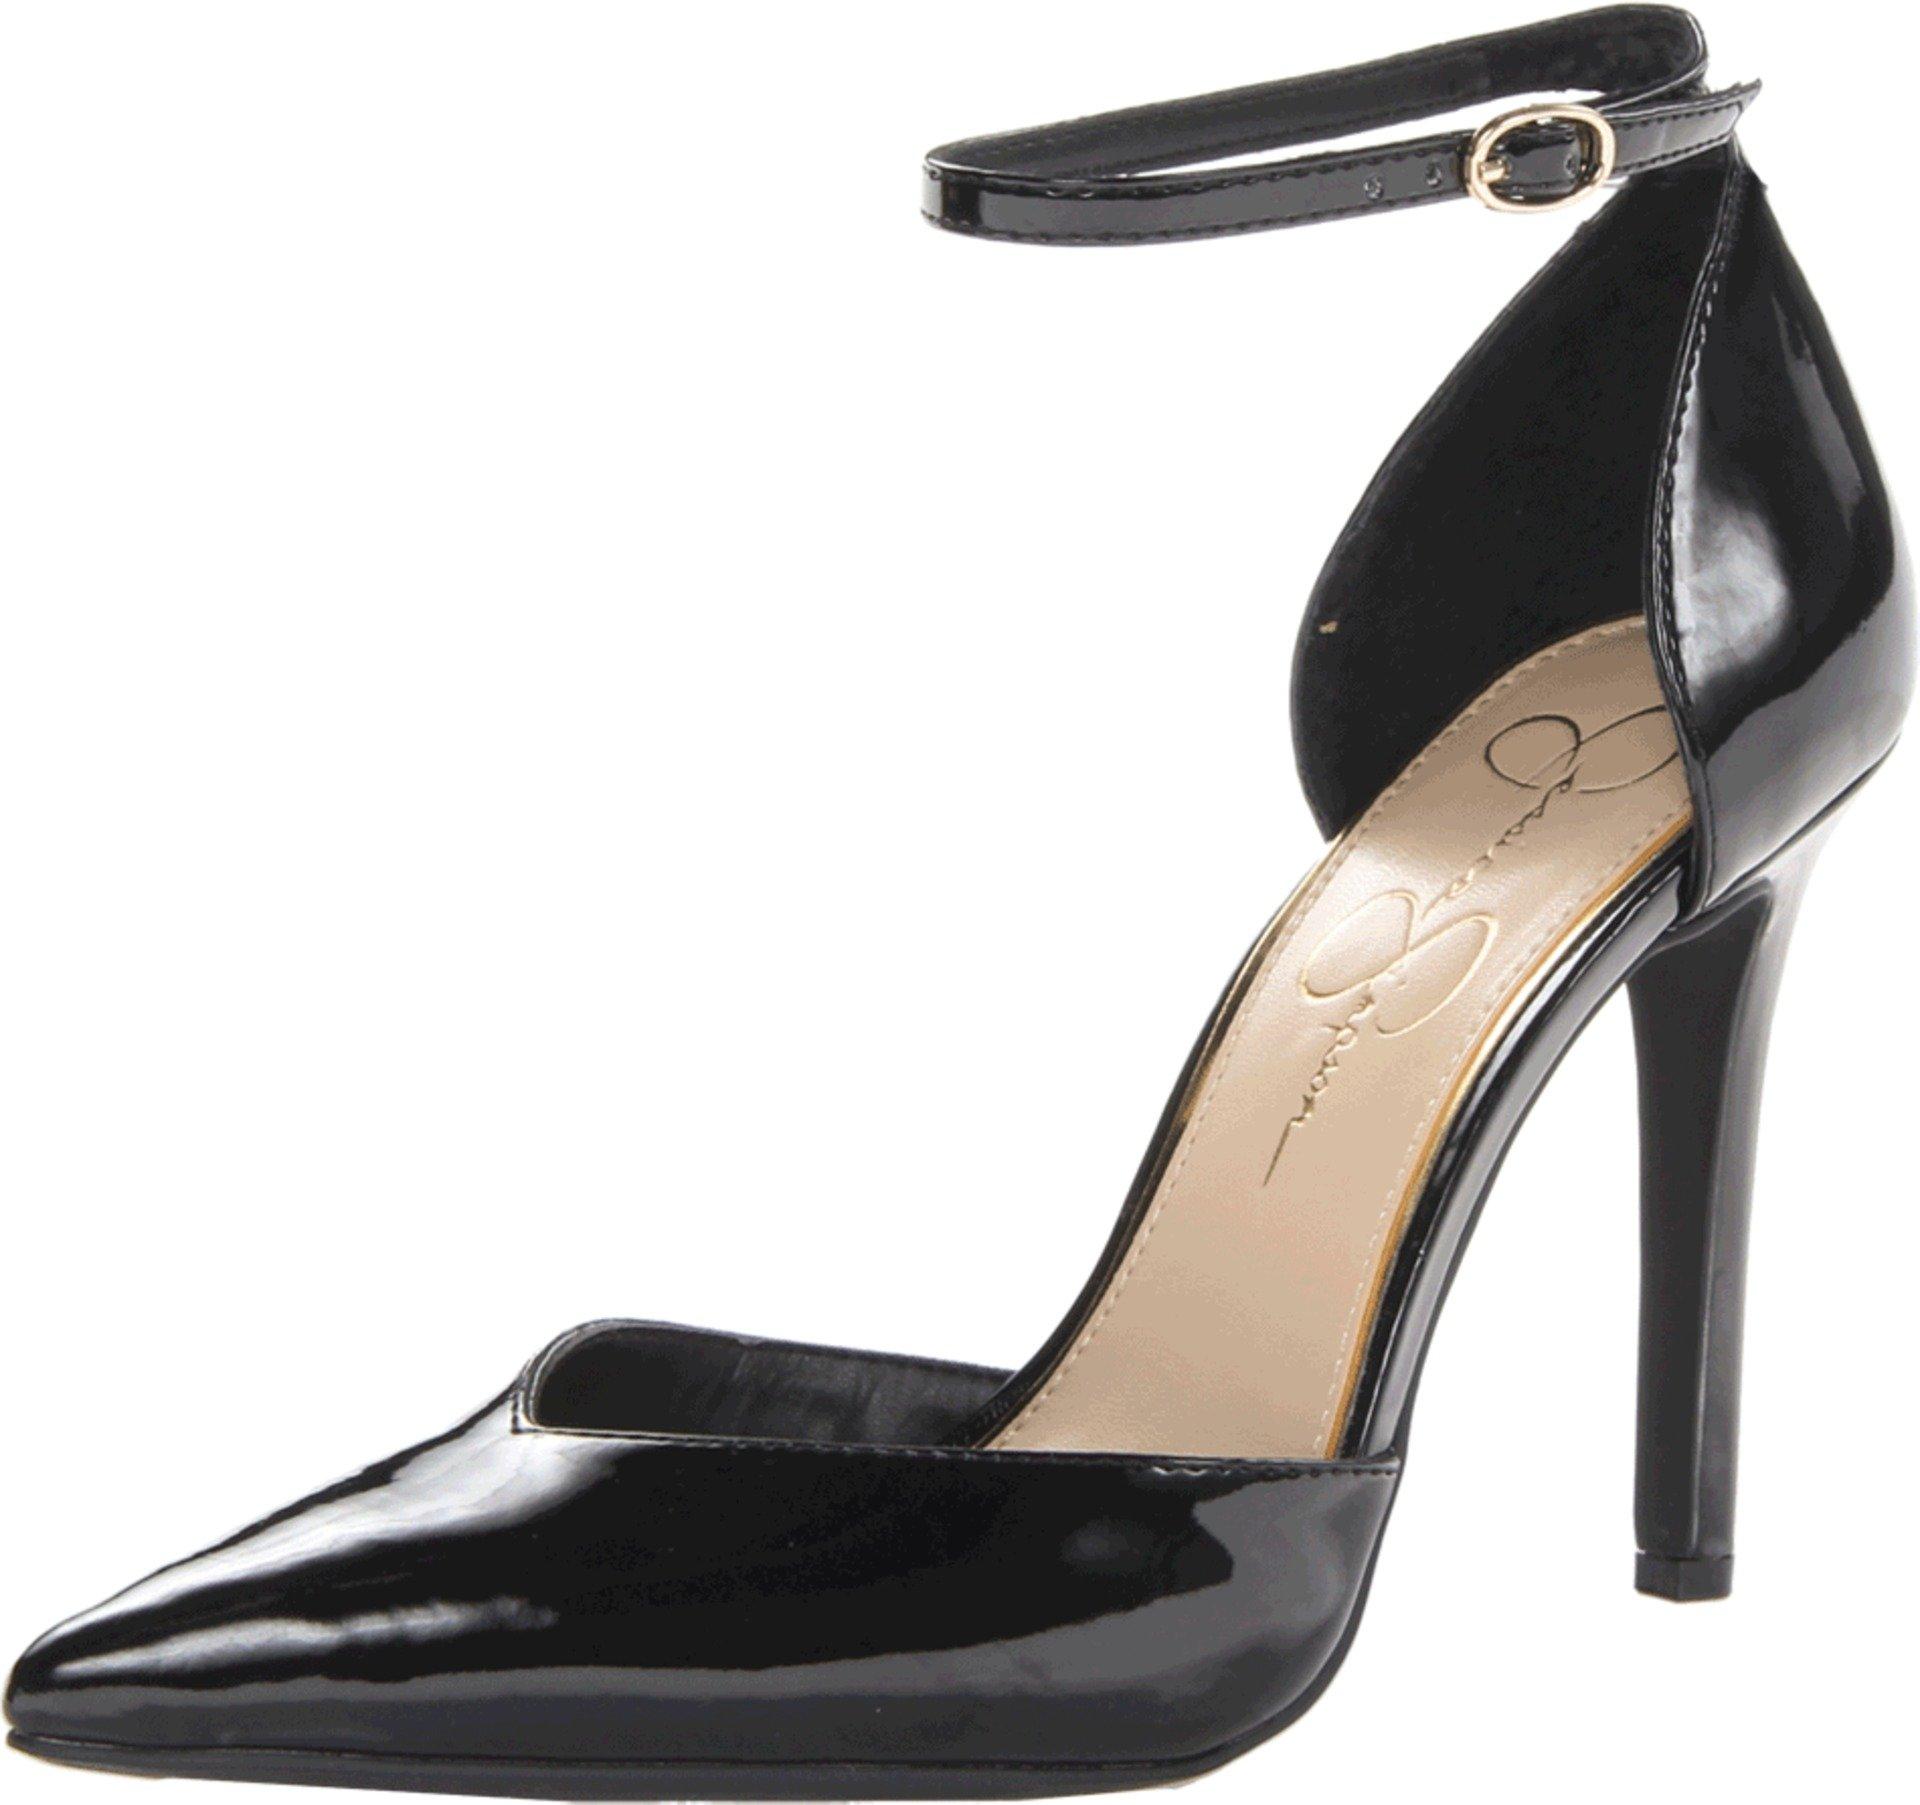 Jessica Simpson Women's Cirrus Dress Pump, Black, 8 Medium US